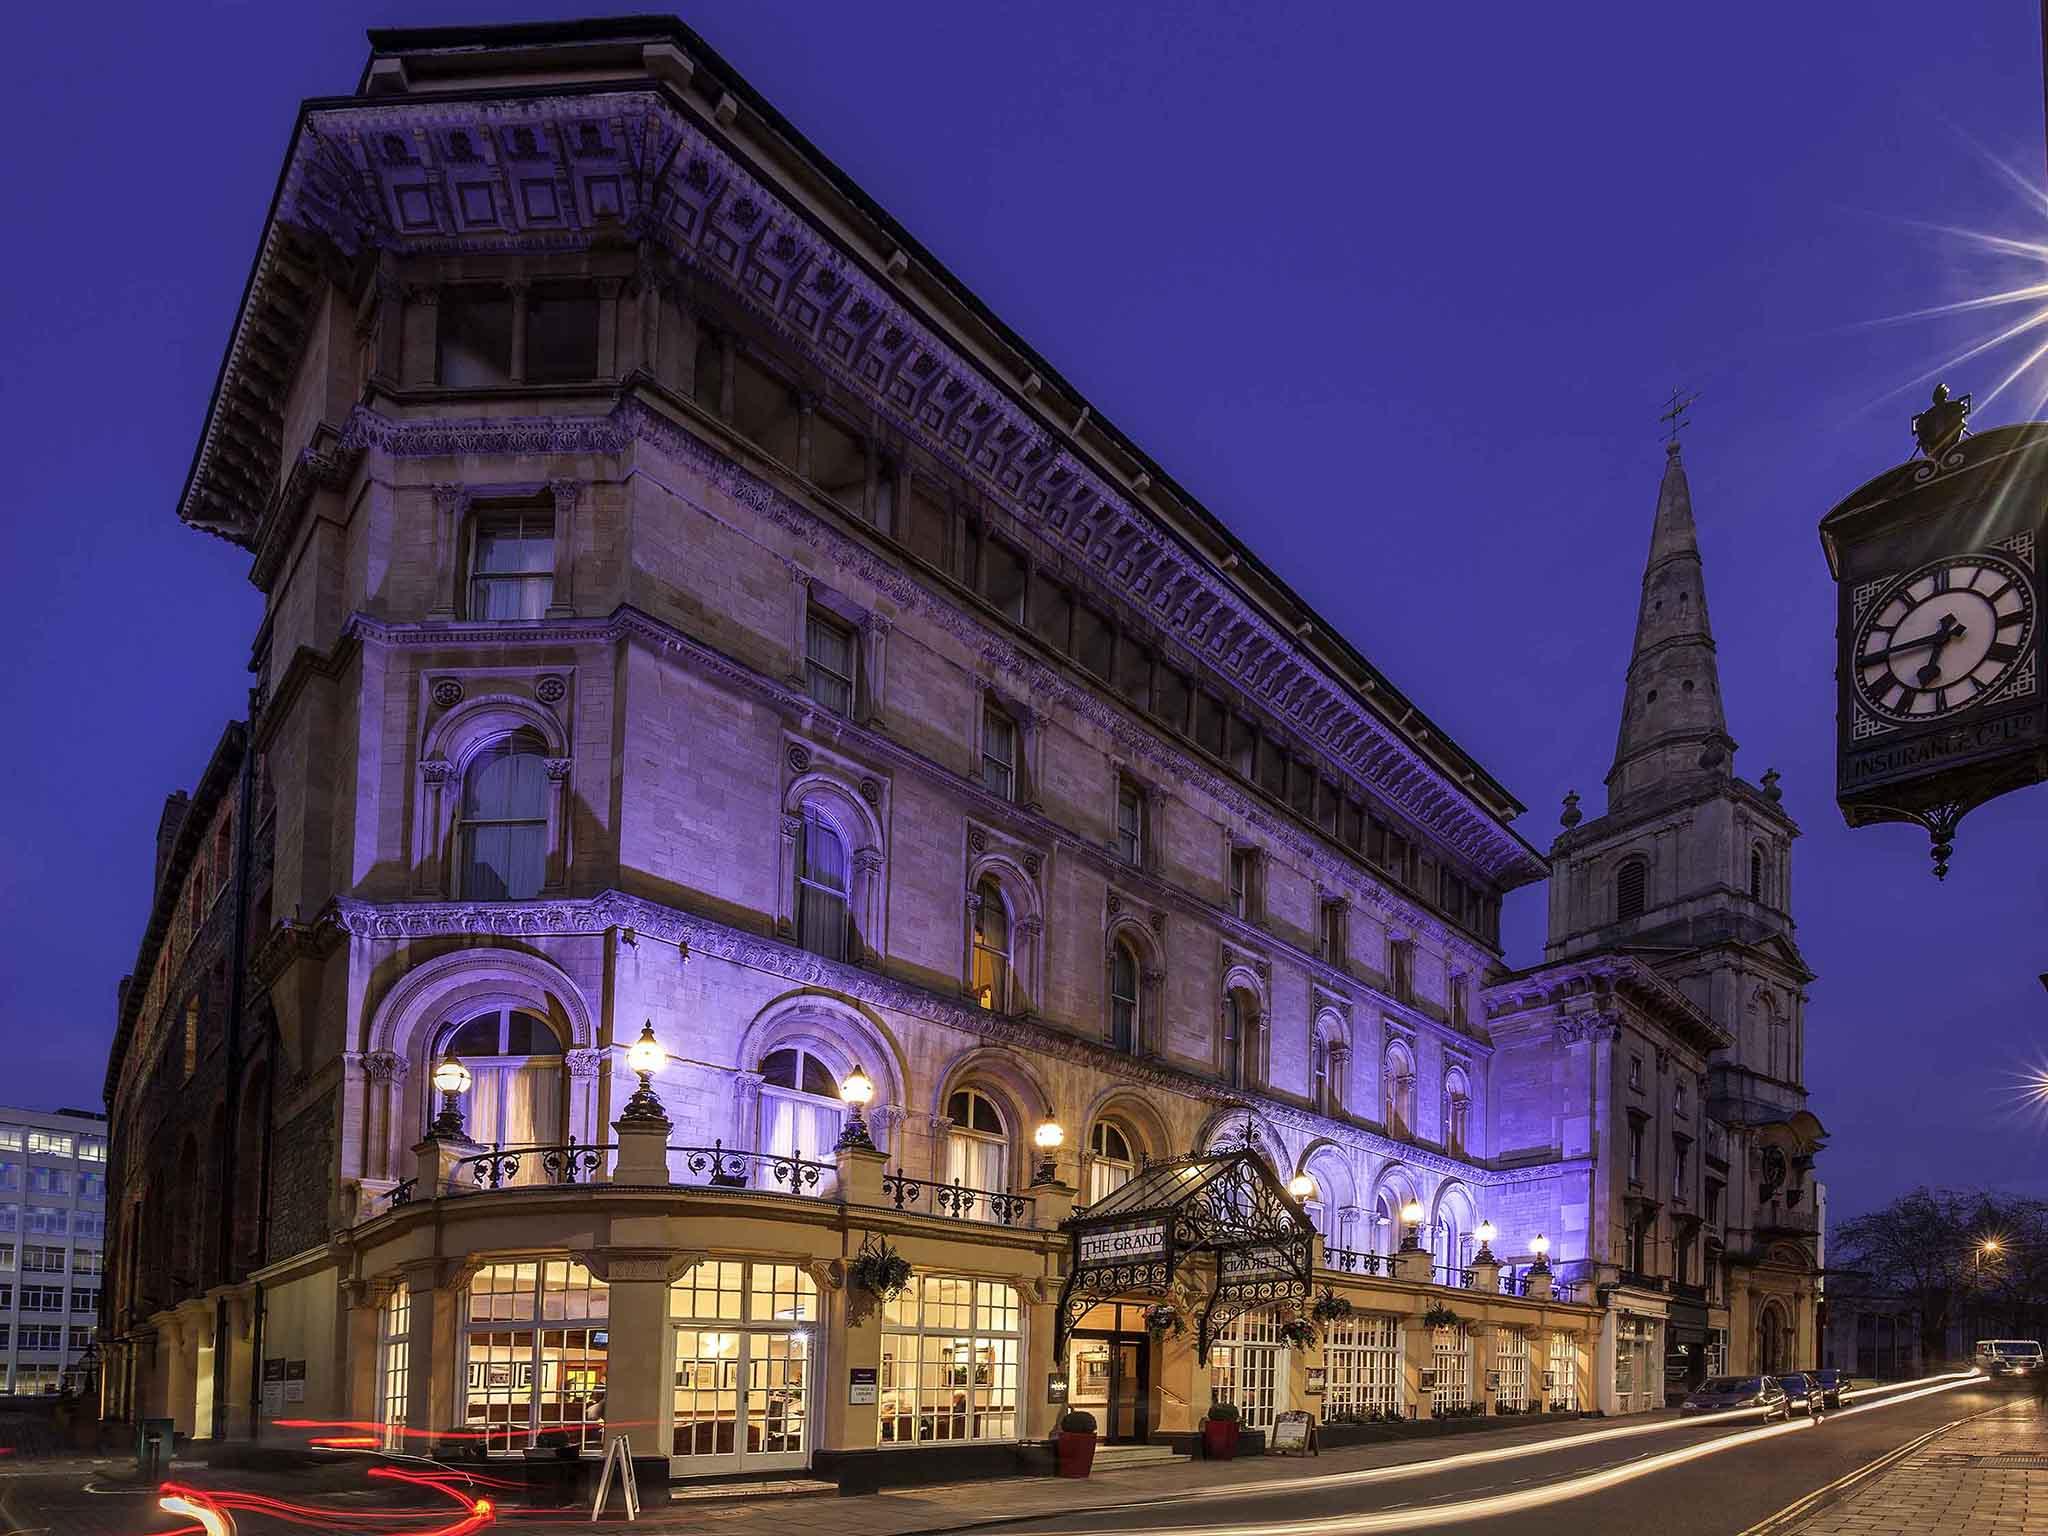 Hotell – Mercure Bristol Grand Hotel (nyrenoverat)